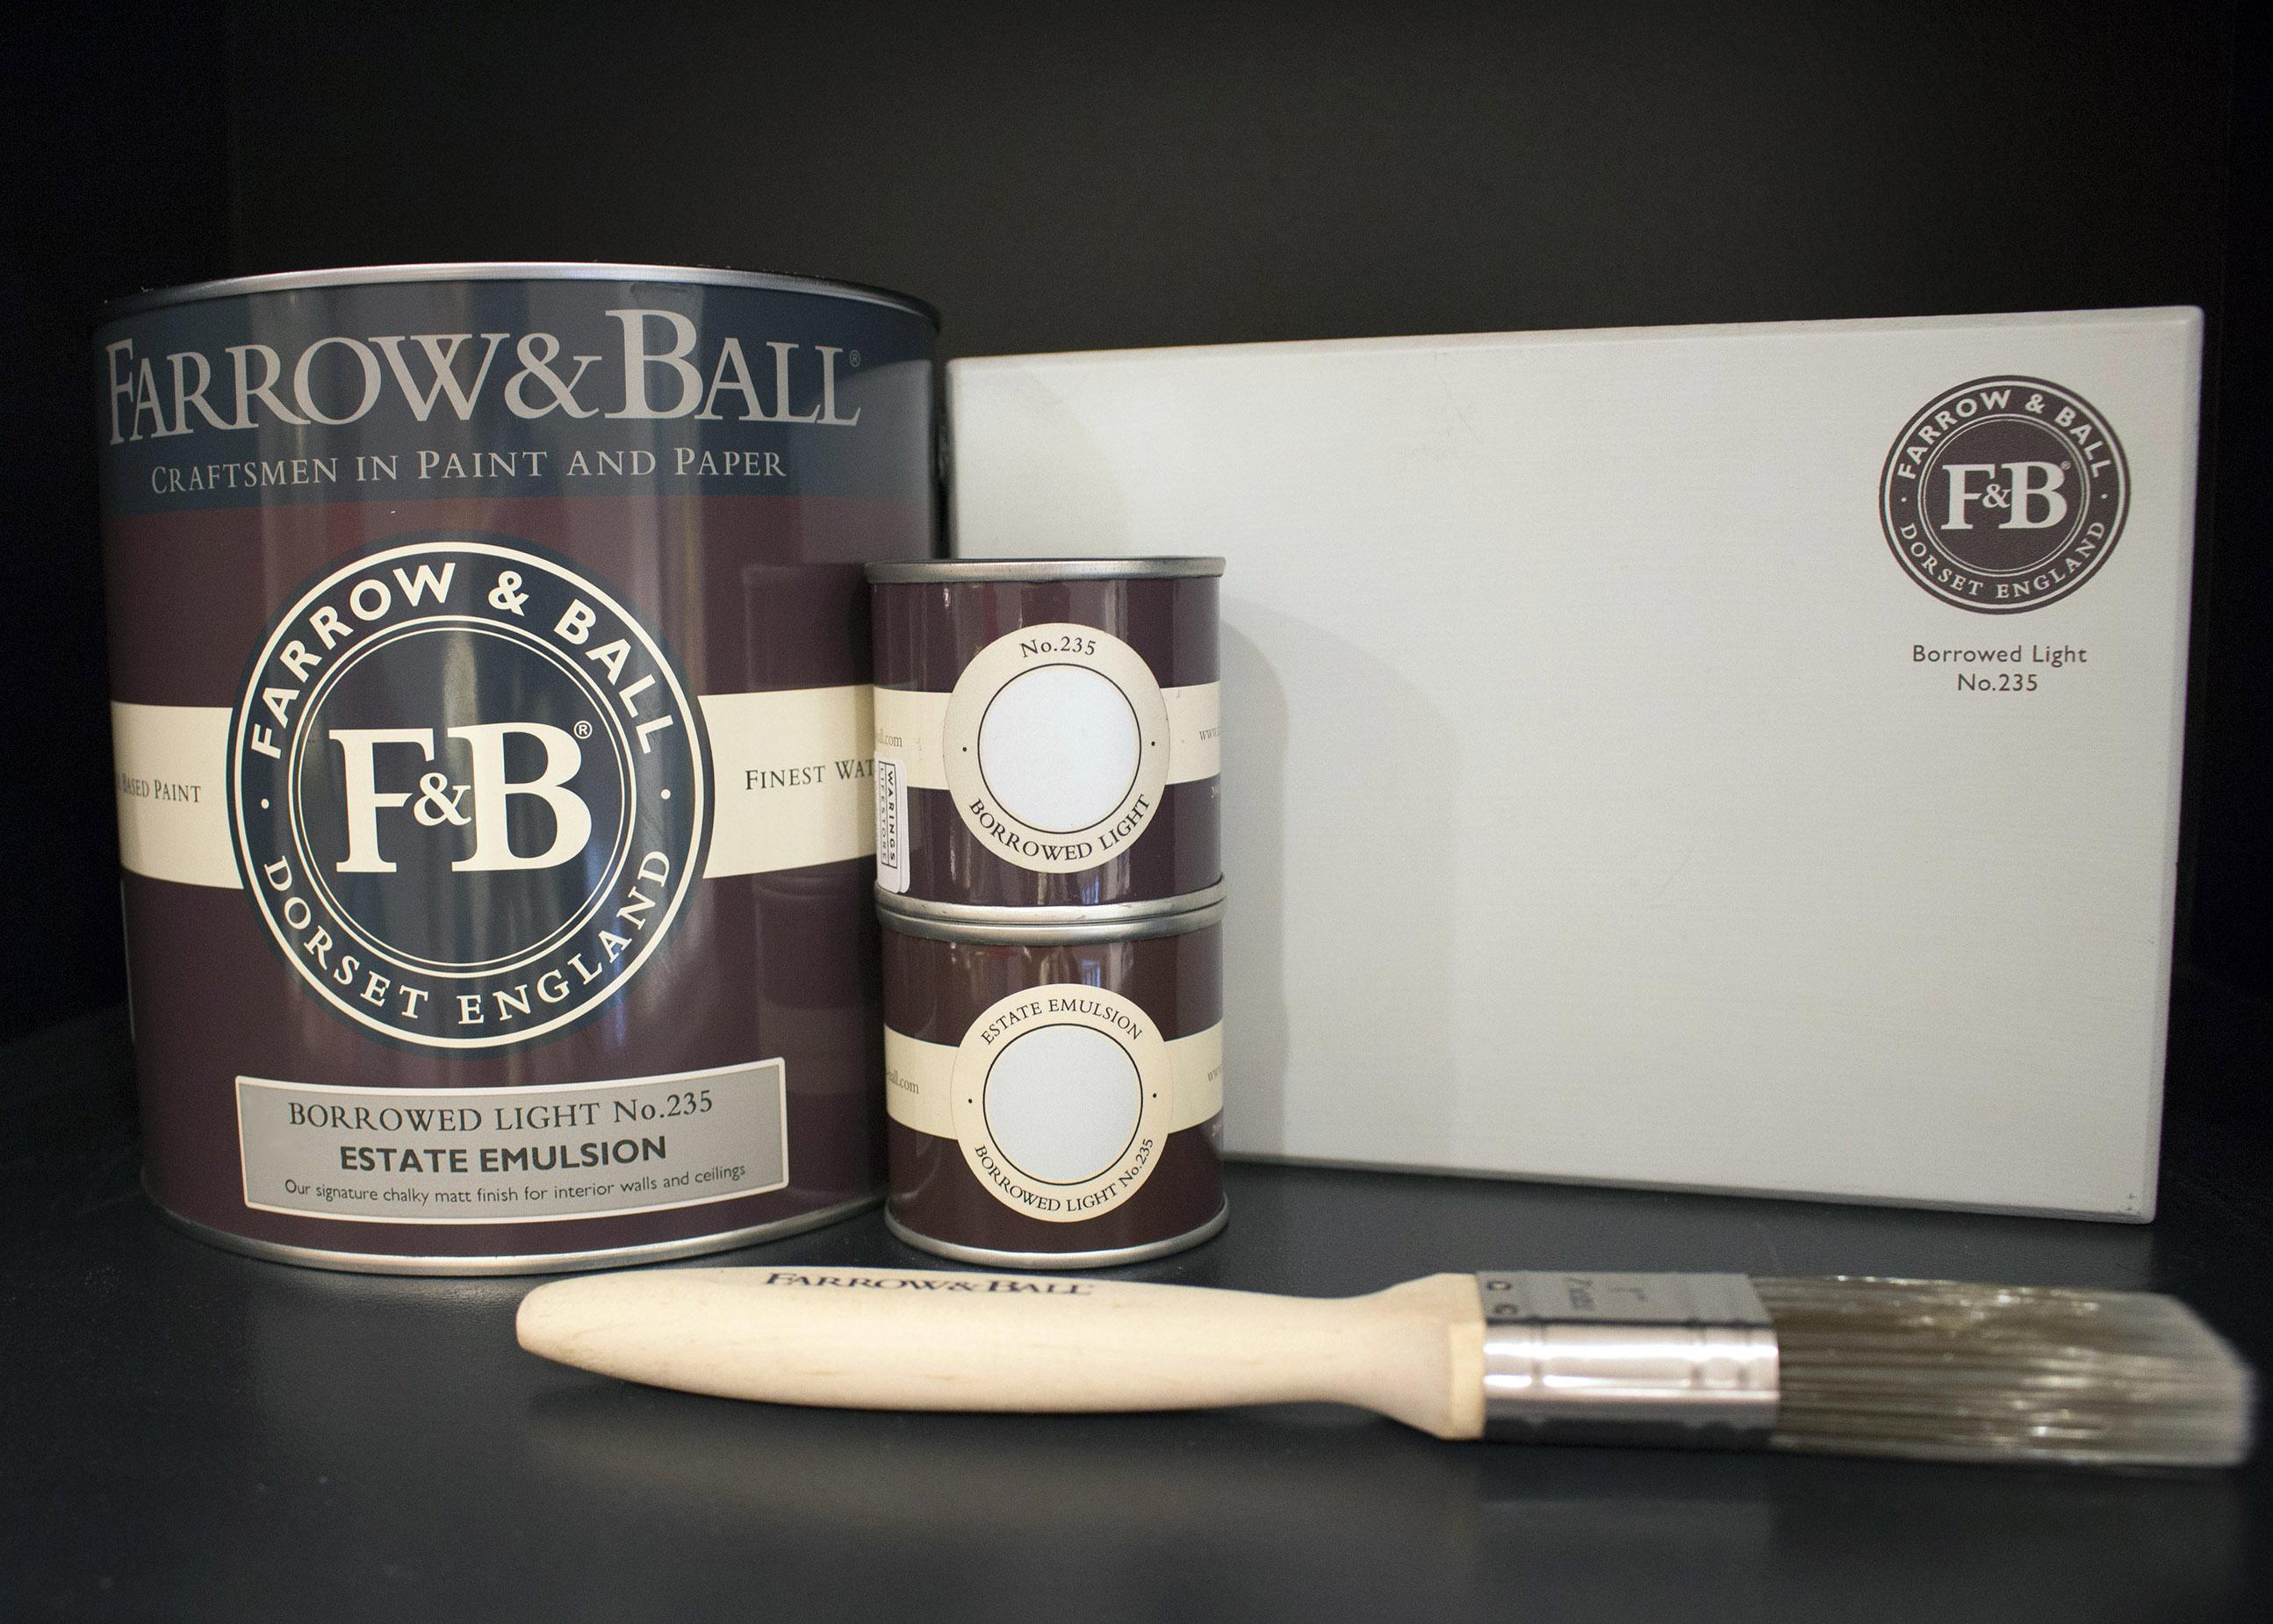 farrow&ball, farrow and ball, paint, decorating, paint brush, borrowed light